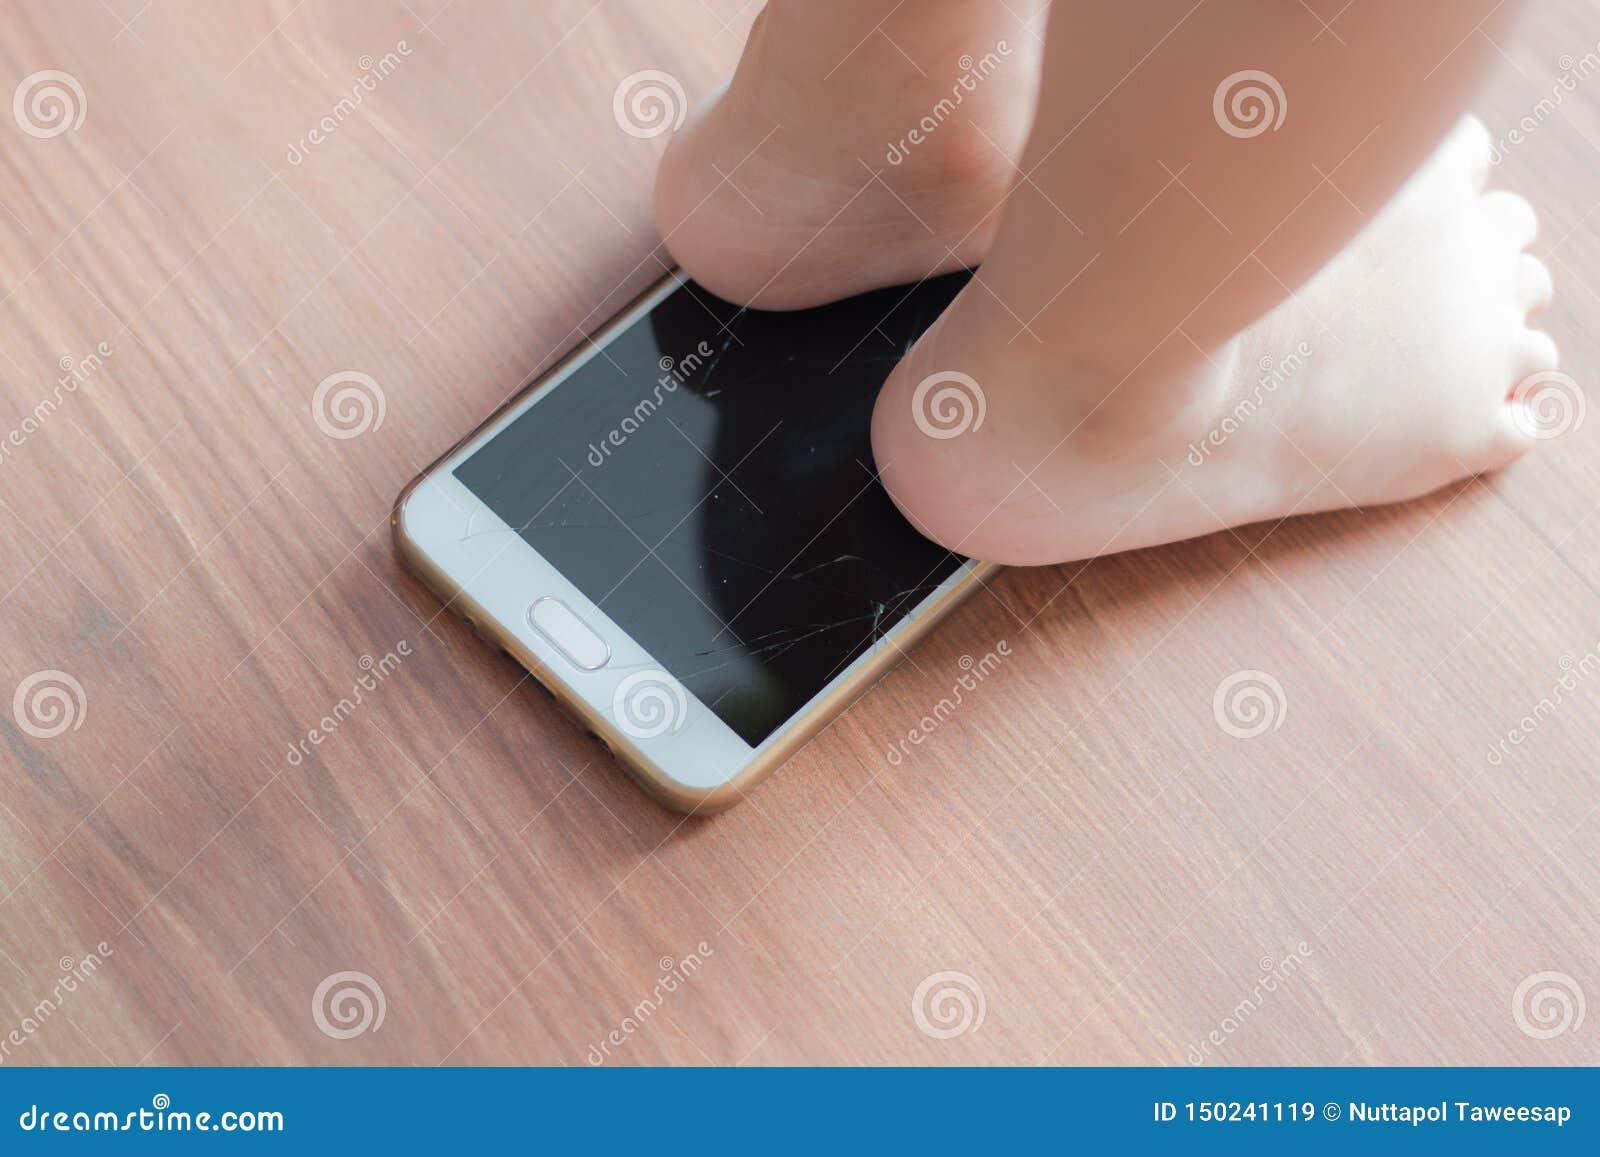 Mobile broken screen by kids